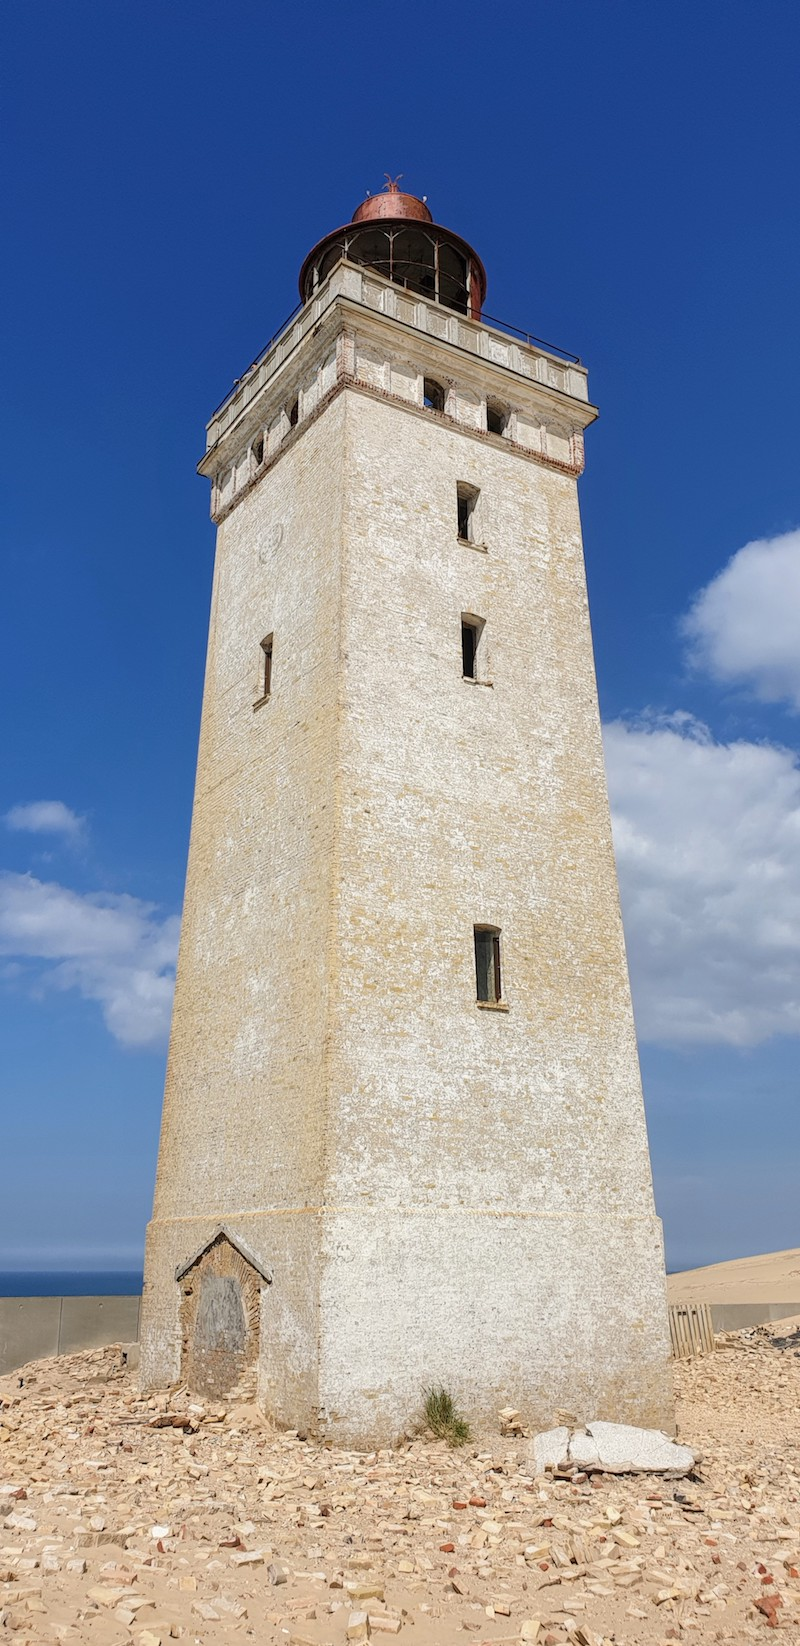 Rudbjerg Knude lighthouse decay